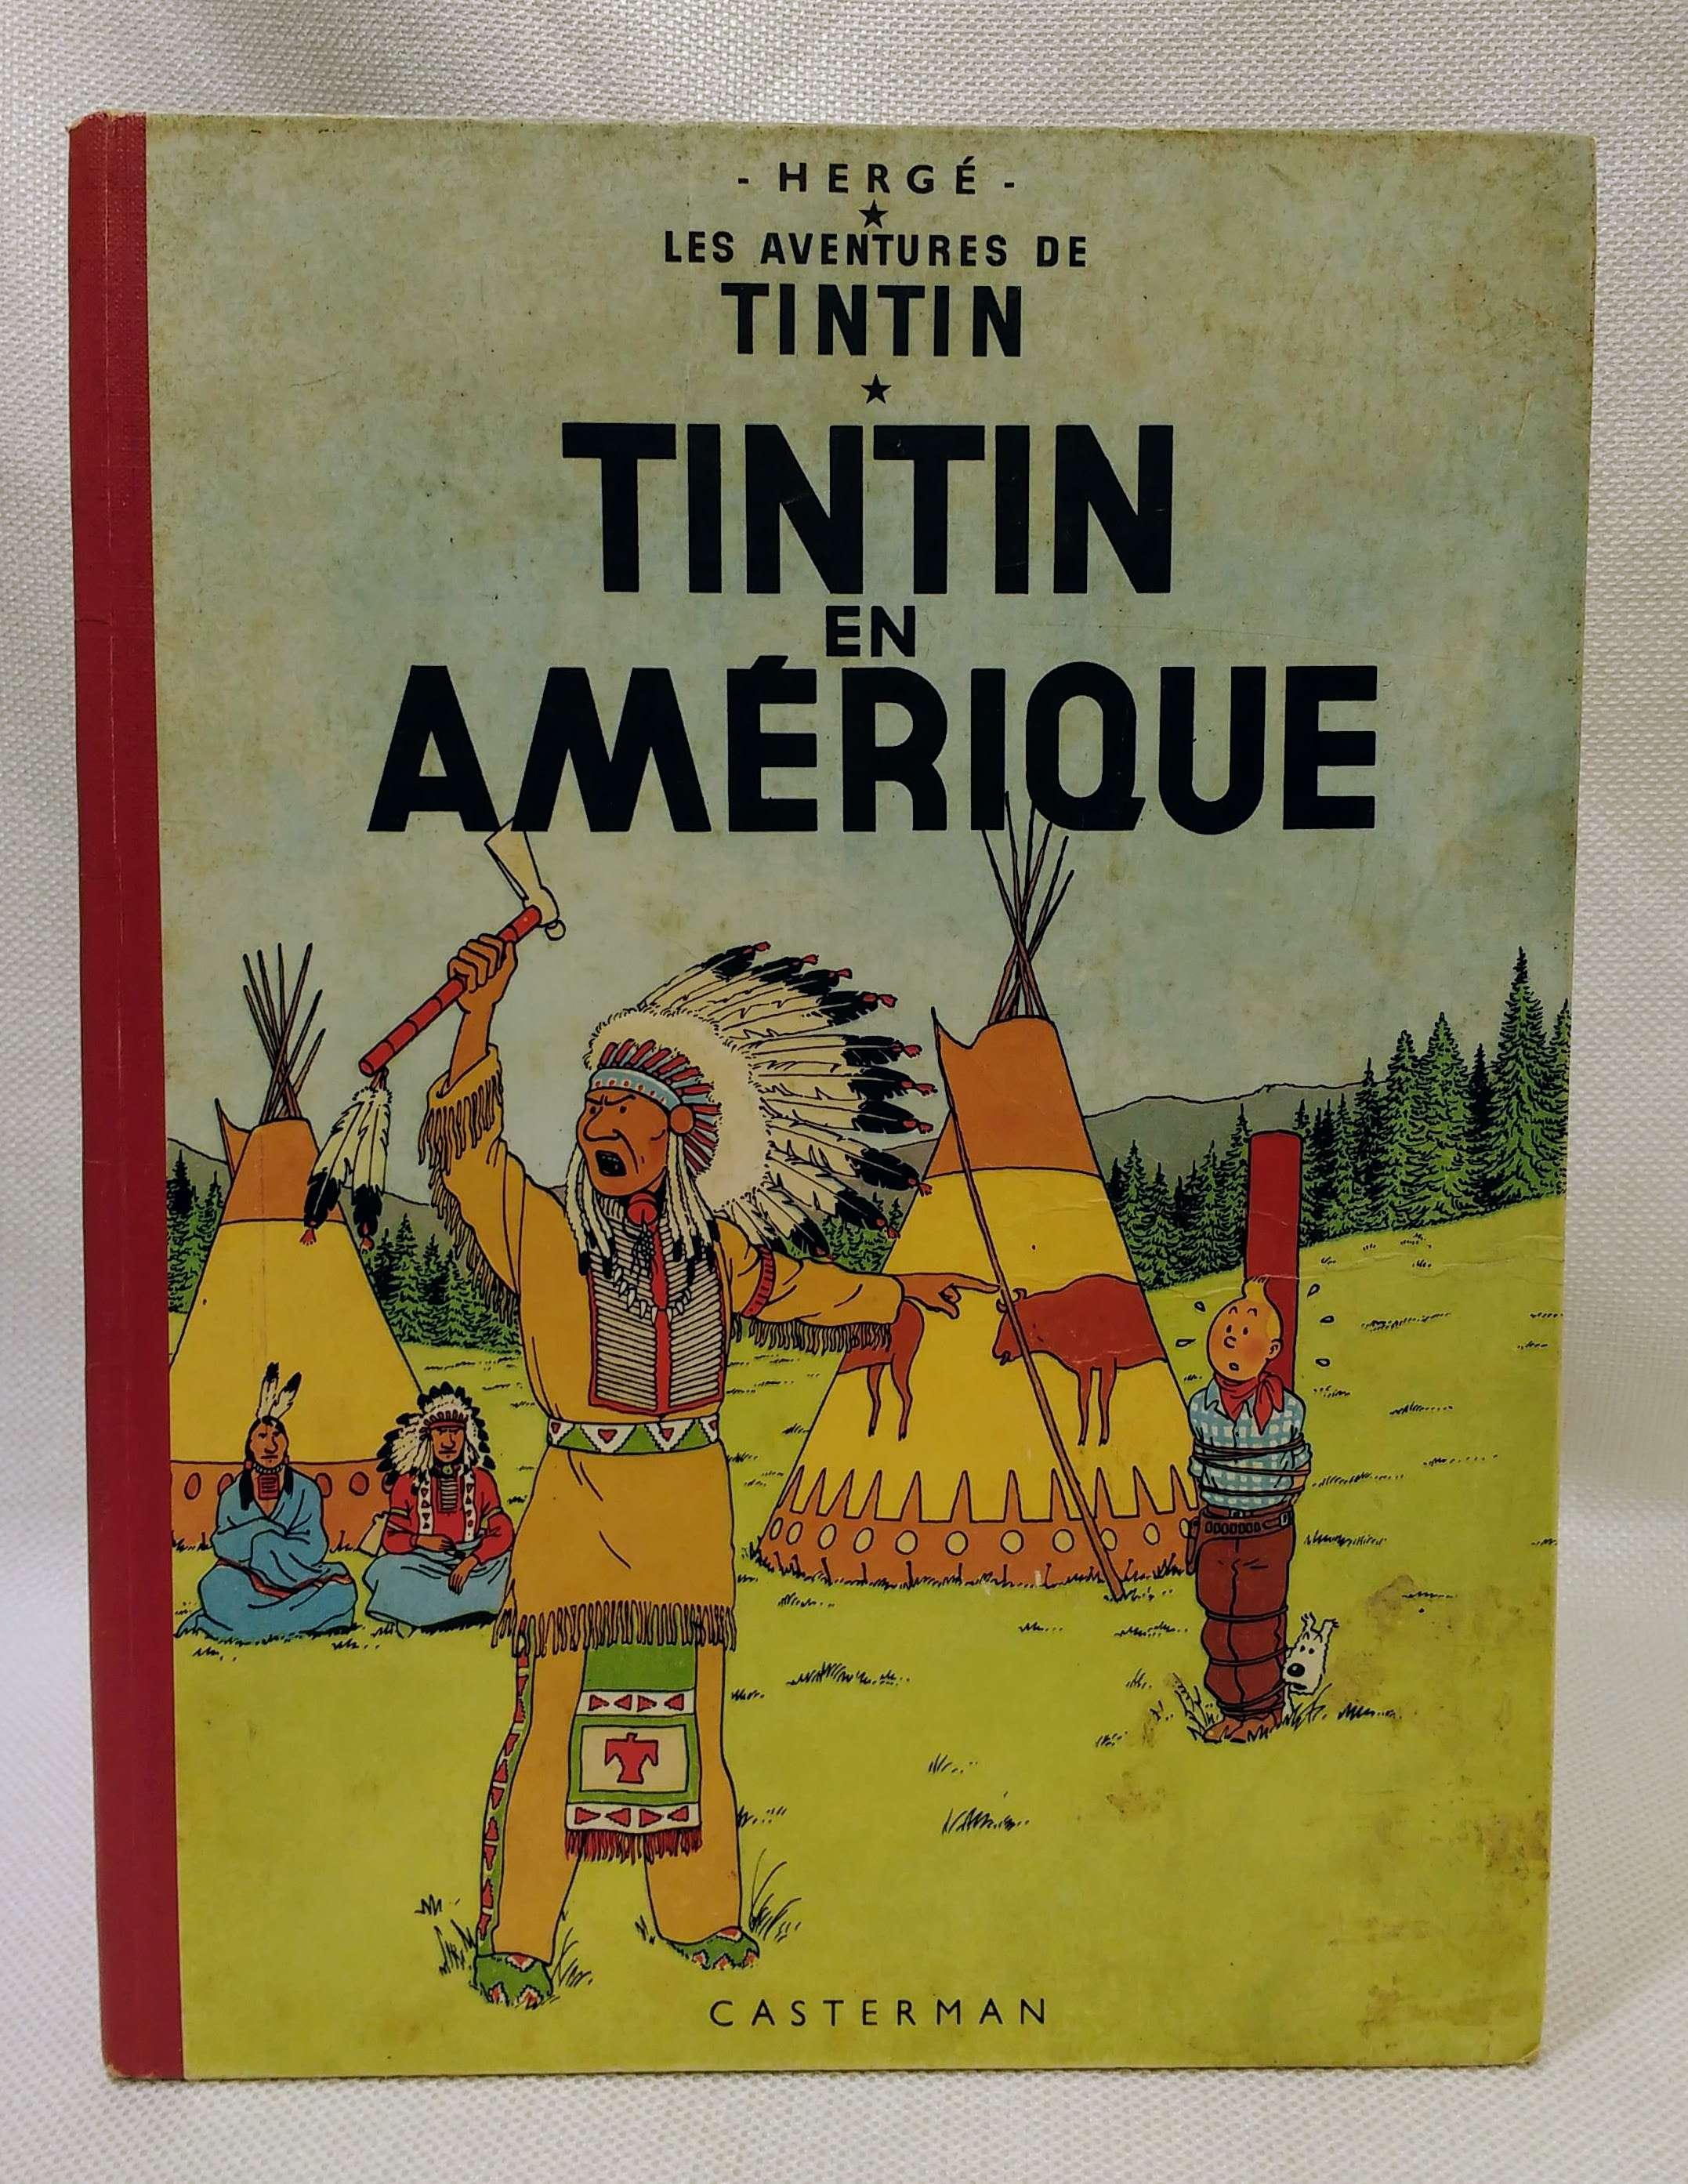 Les Aventures de Tintin: Tintin en Amerique (French Edition of Tintin in America), Herge